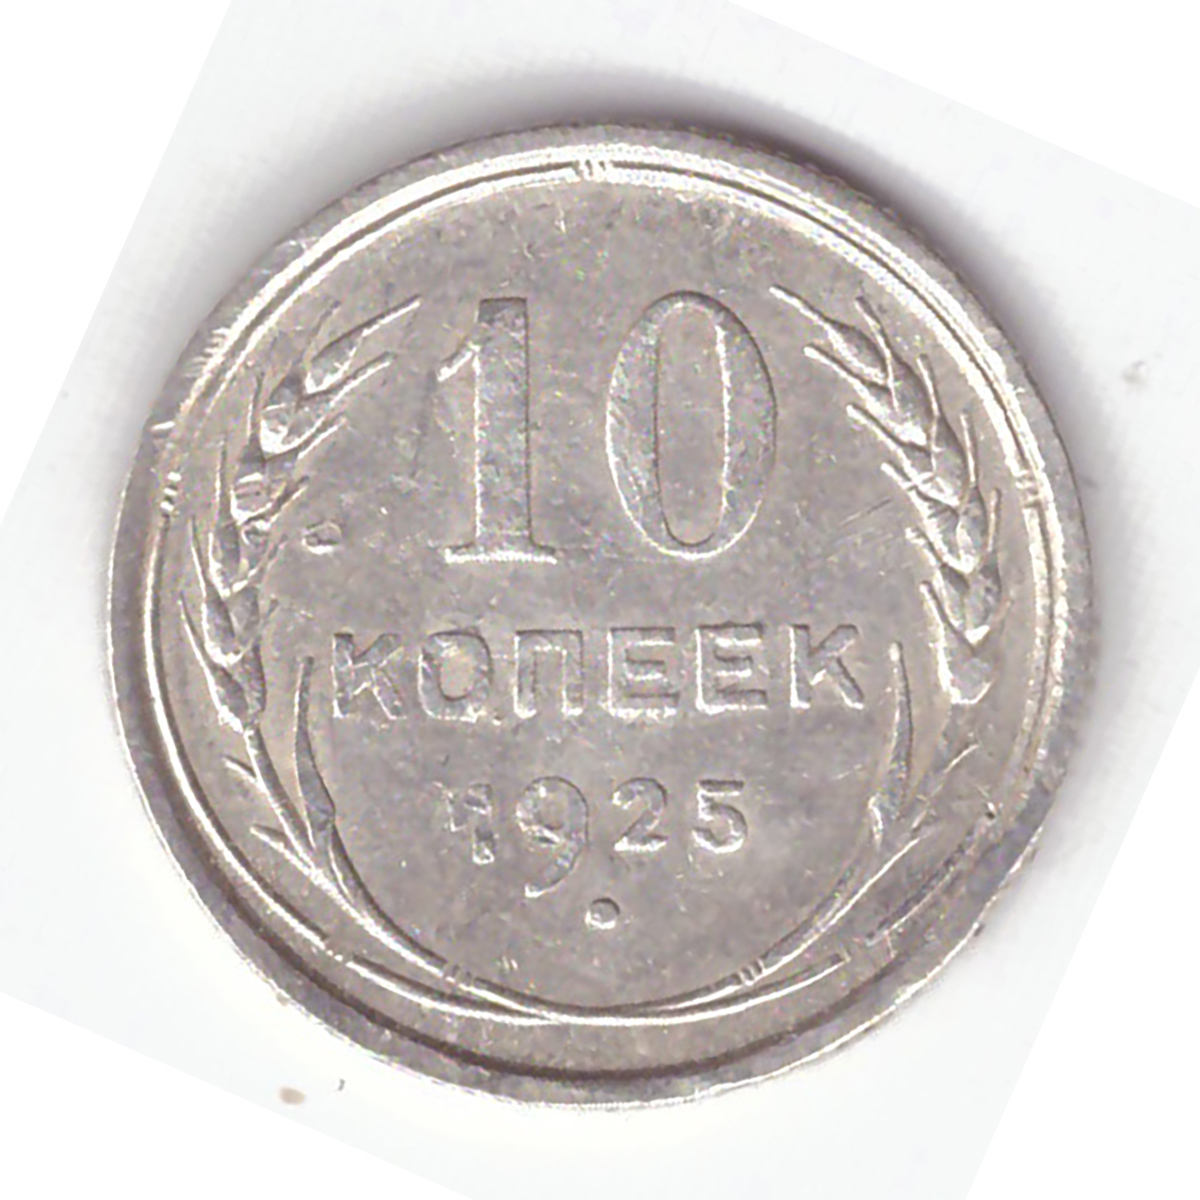 10 копеек 1925 года F №7